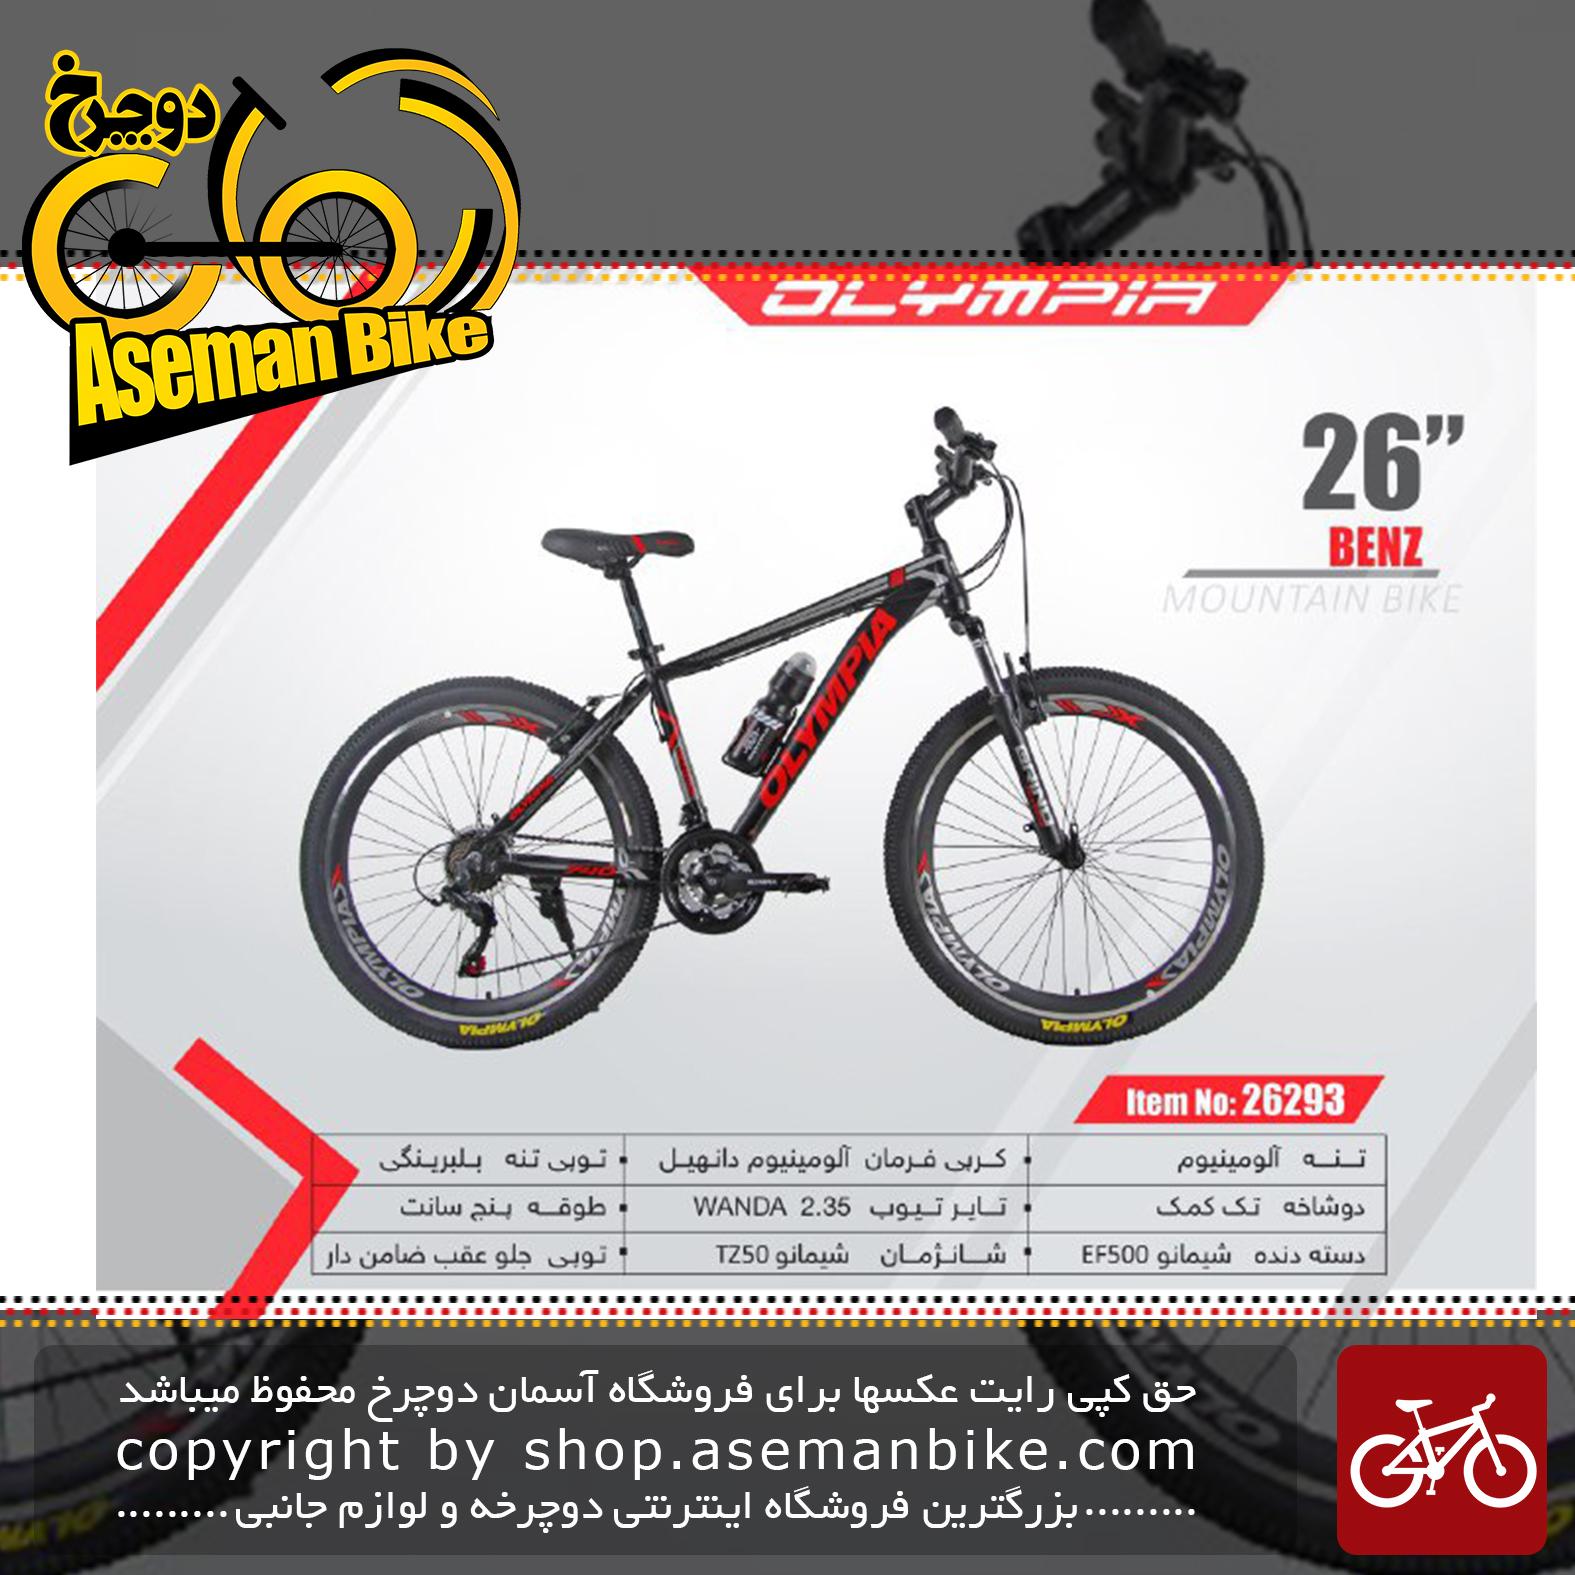 دوچرخه کوهستان المپیا سایز 26مدل بنزOLYMPIA SIZE 26 BENZ